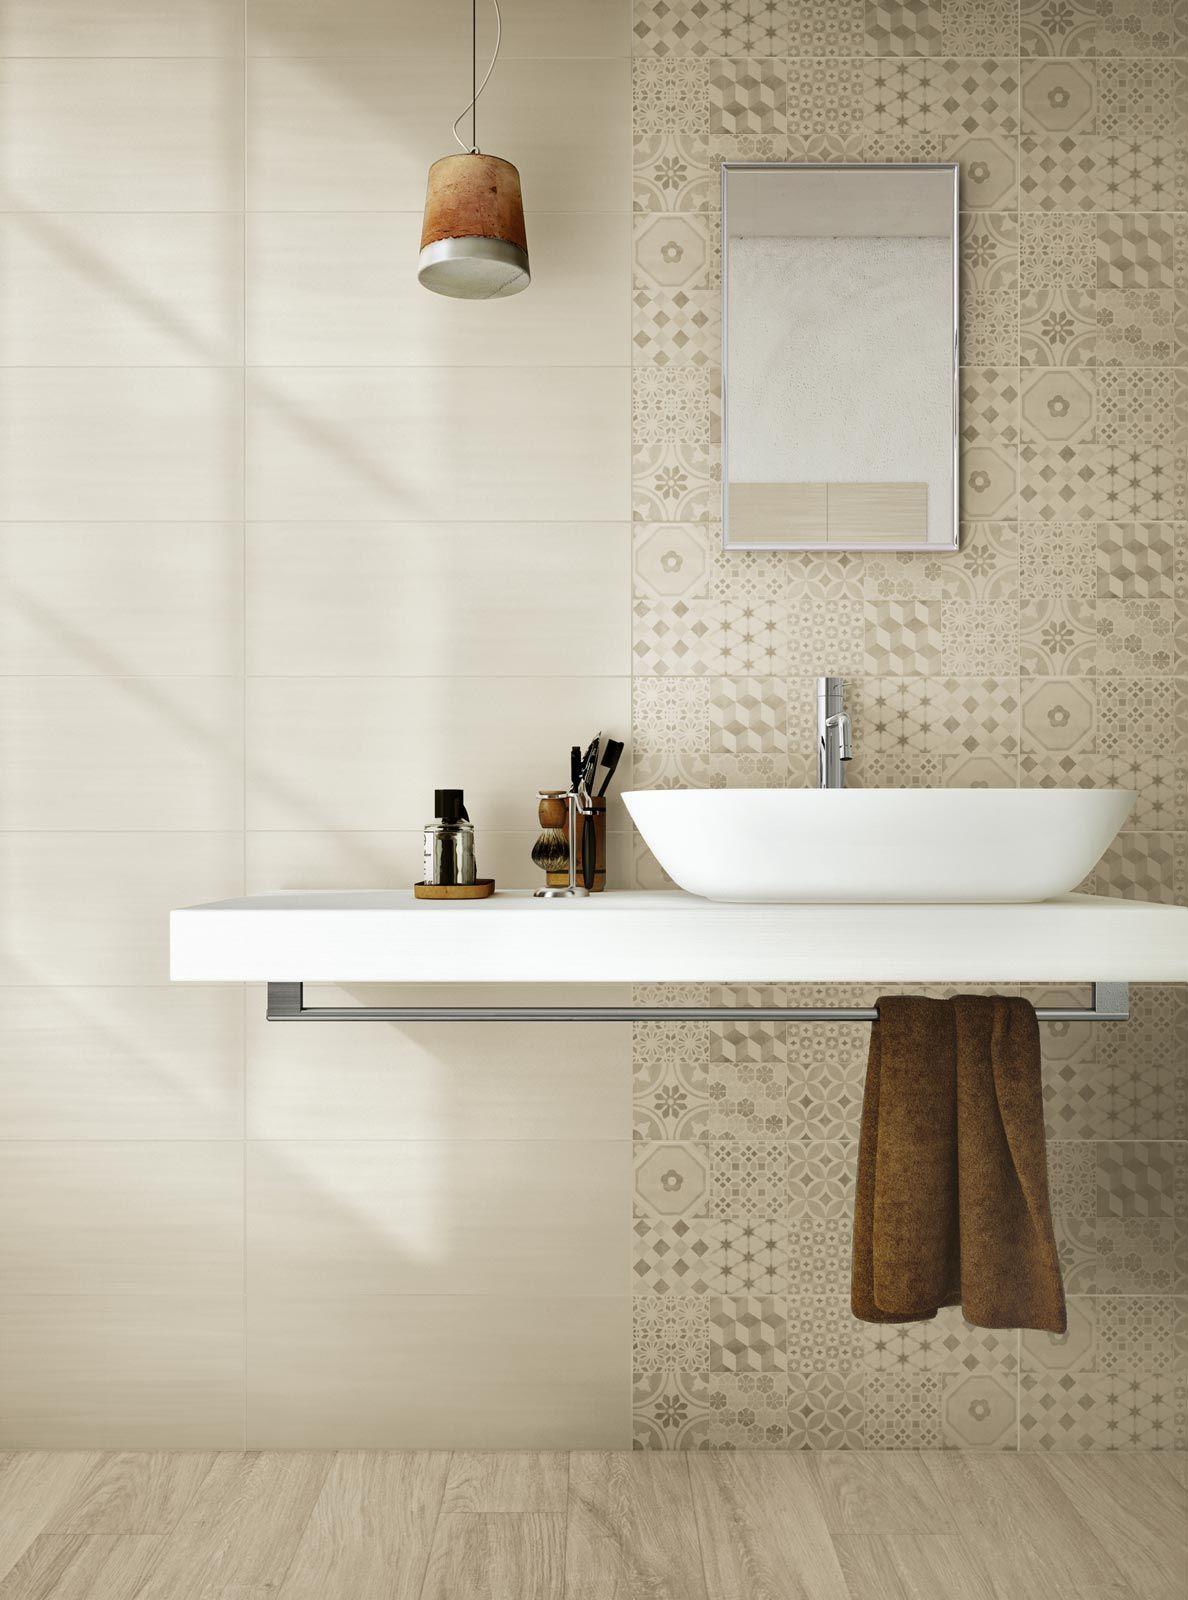 Piastrelle bagno in gres porcellanato ragno bathroom - Piastrellare su piastrelle ...